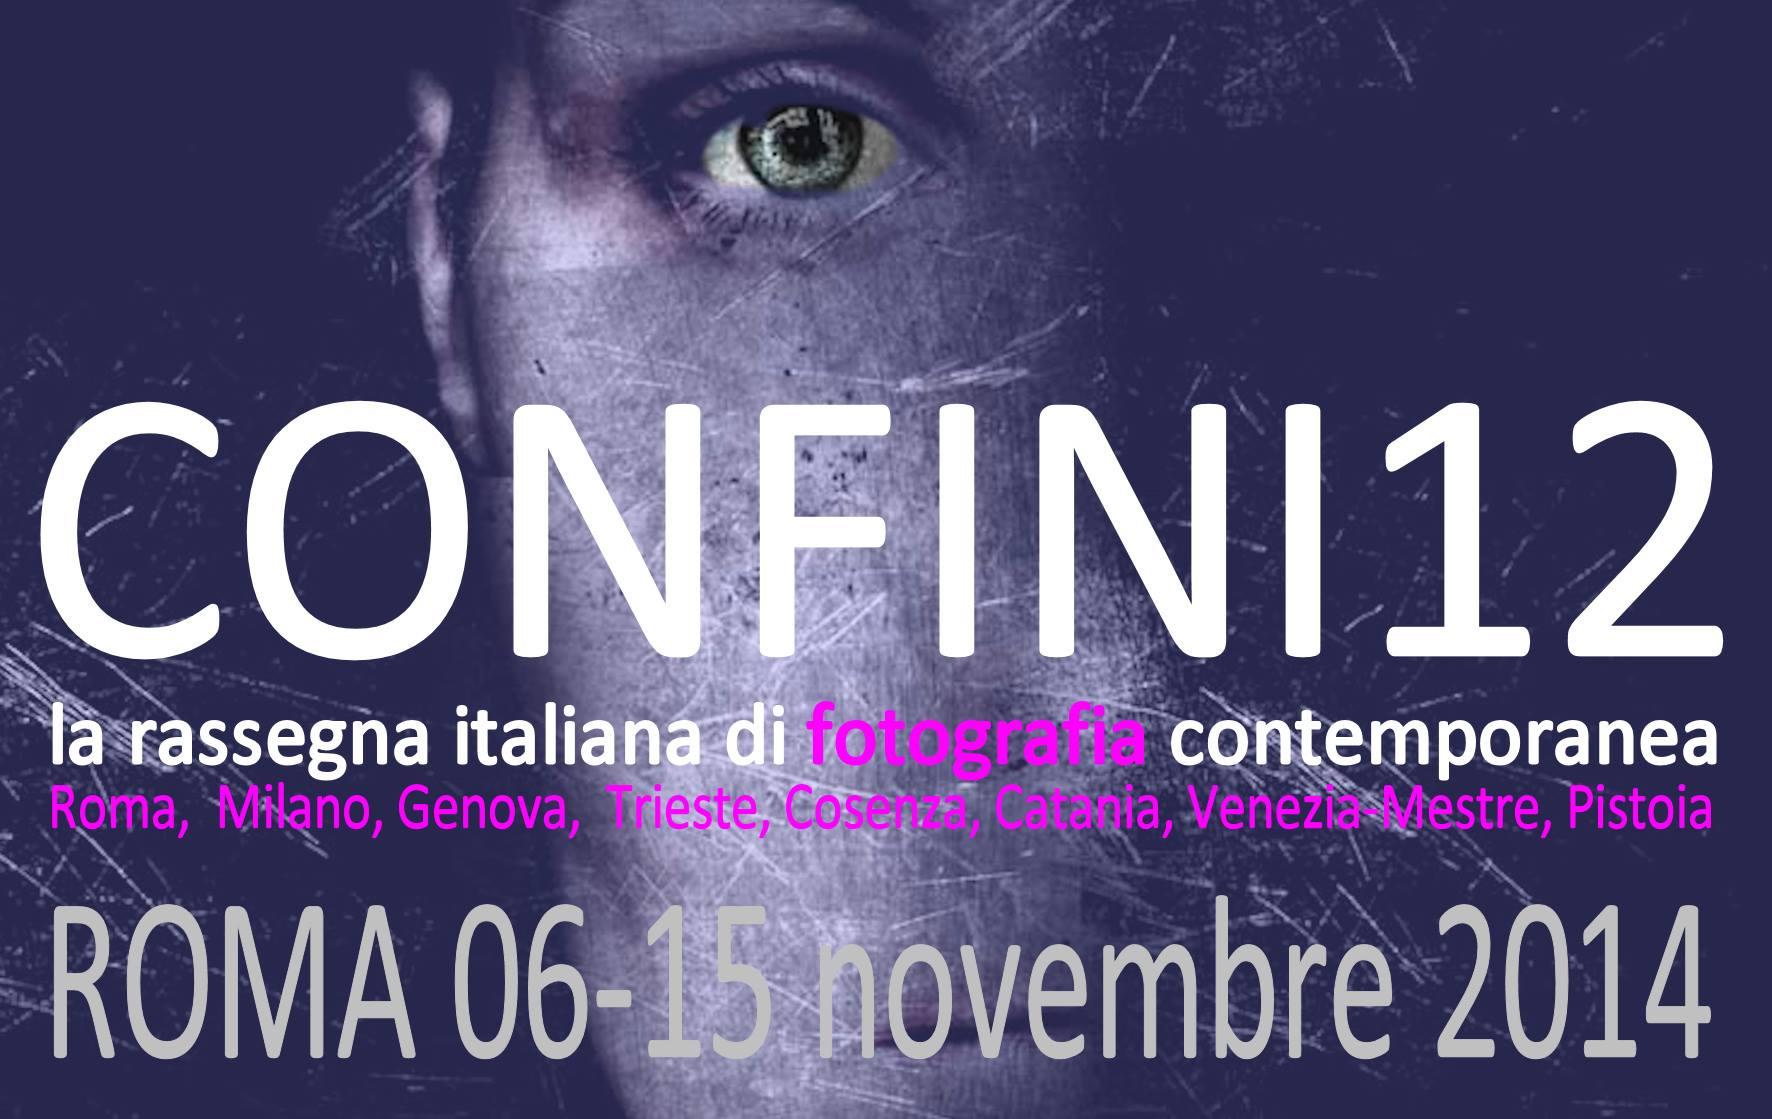 CONFINI 12 – ÉTAPE #1